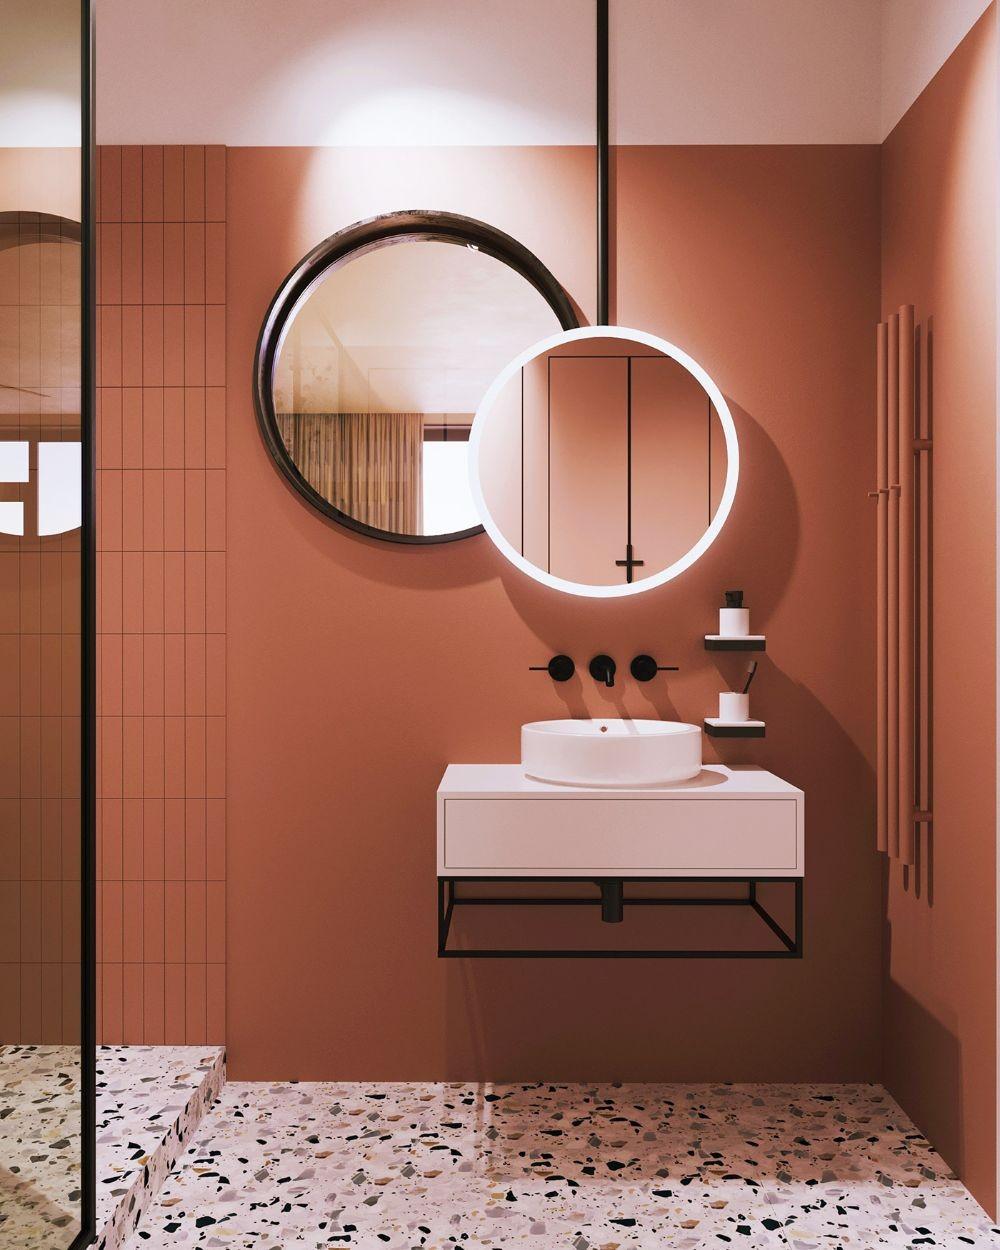 salle de bains terracotta et terrazzo